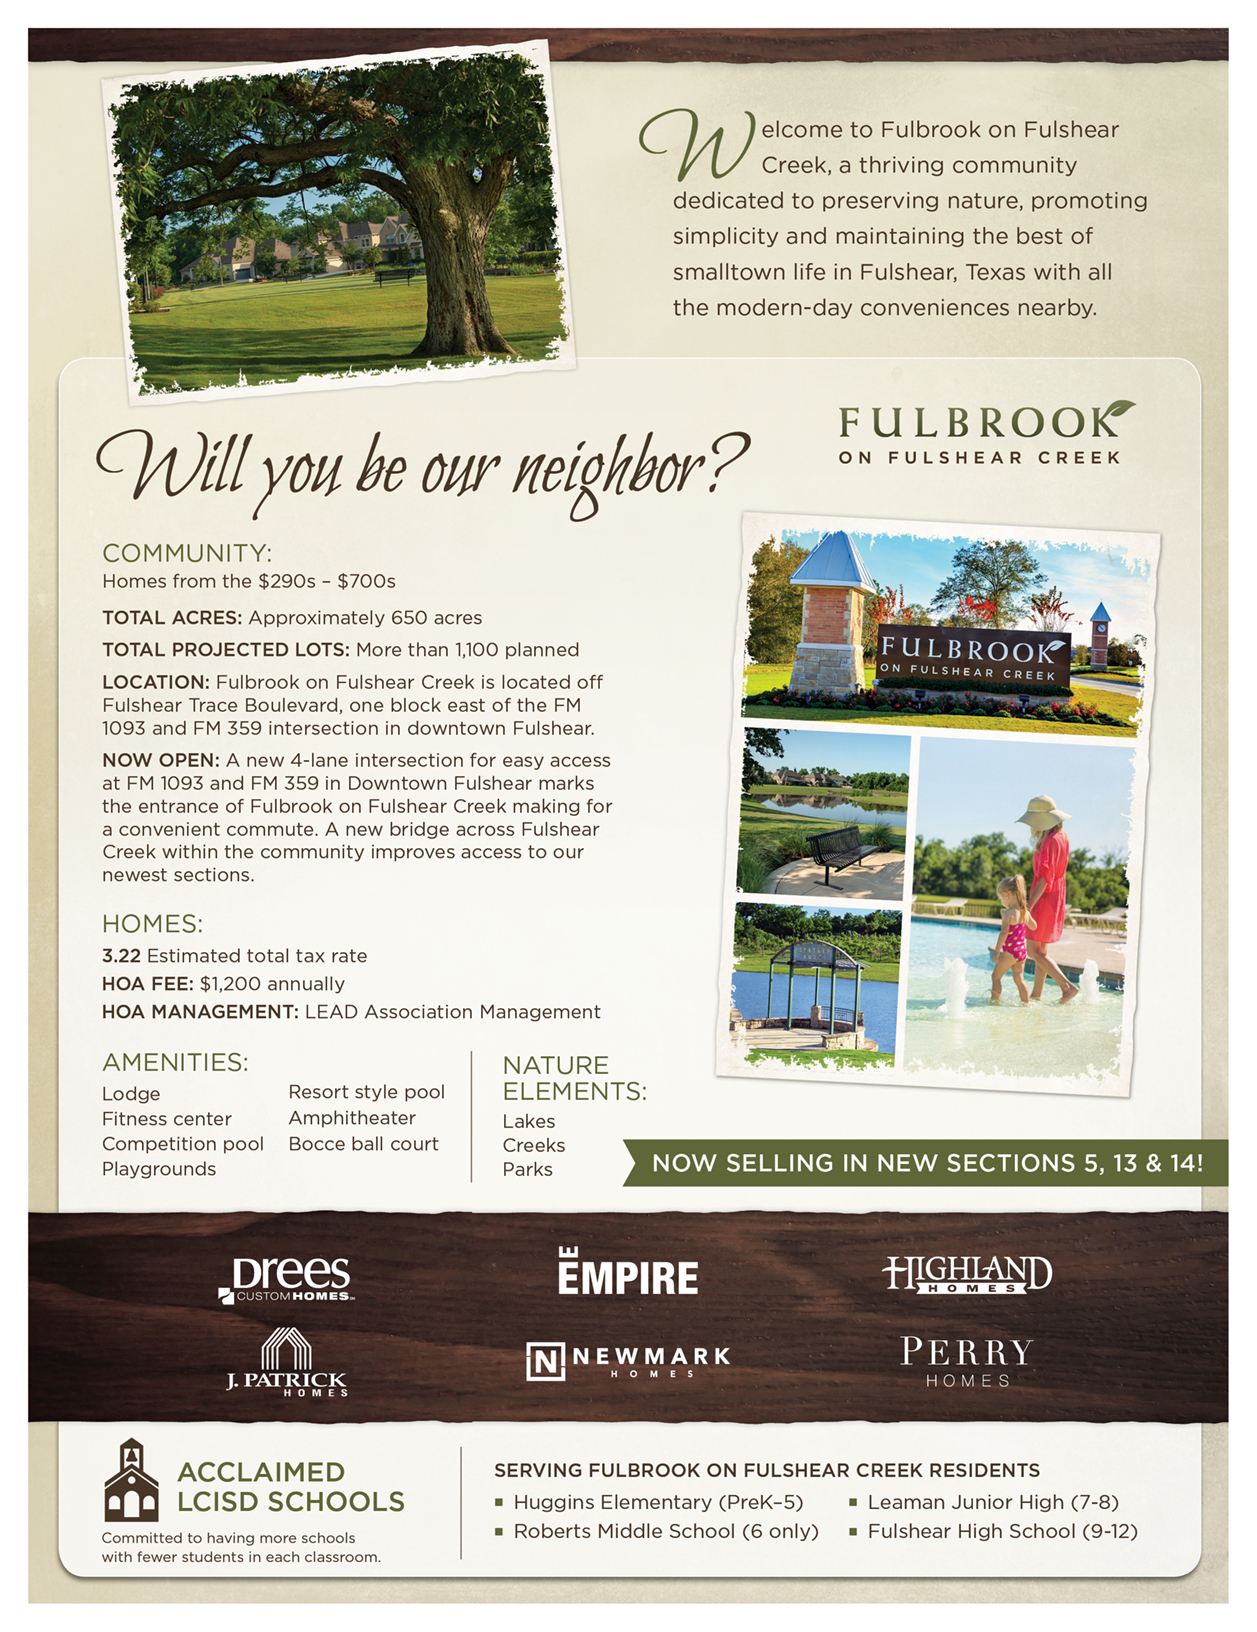 Fulbrook on Fulshear Creek Fact Sheet